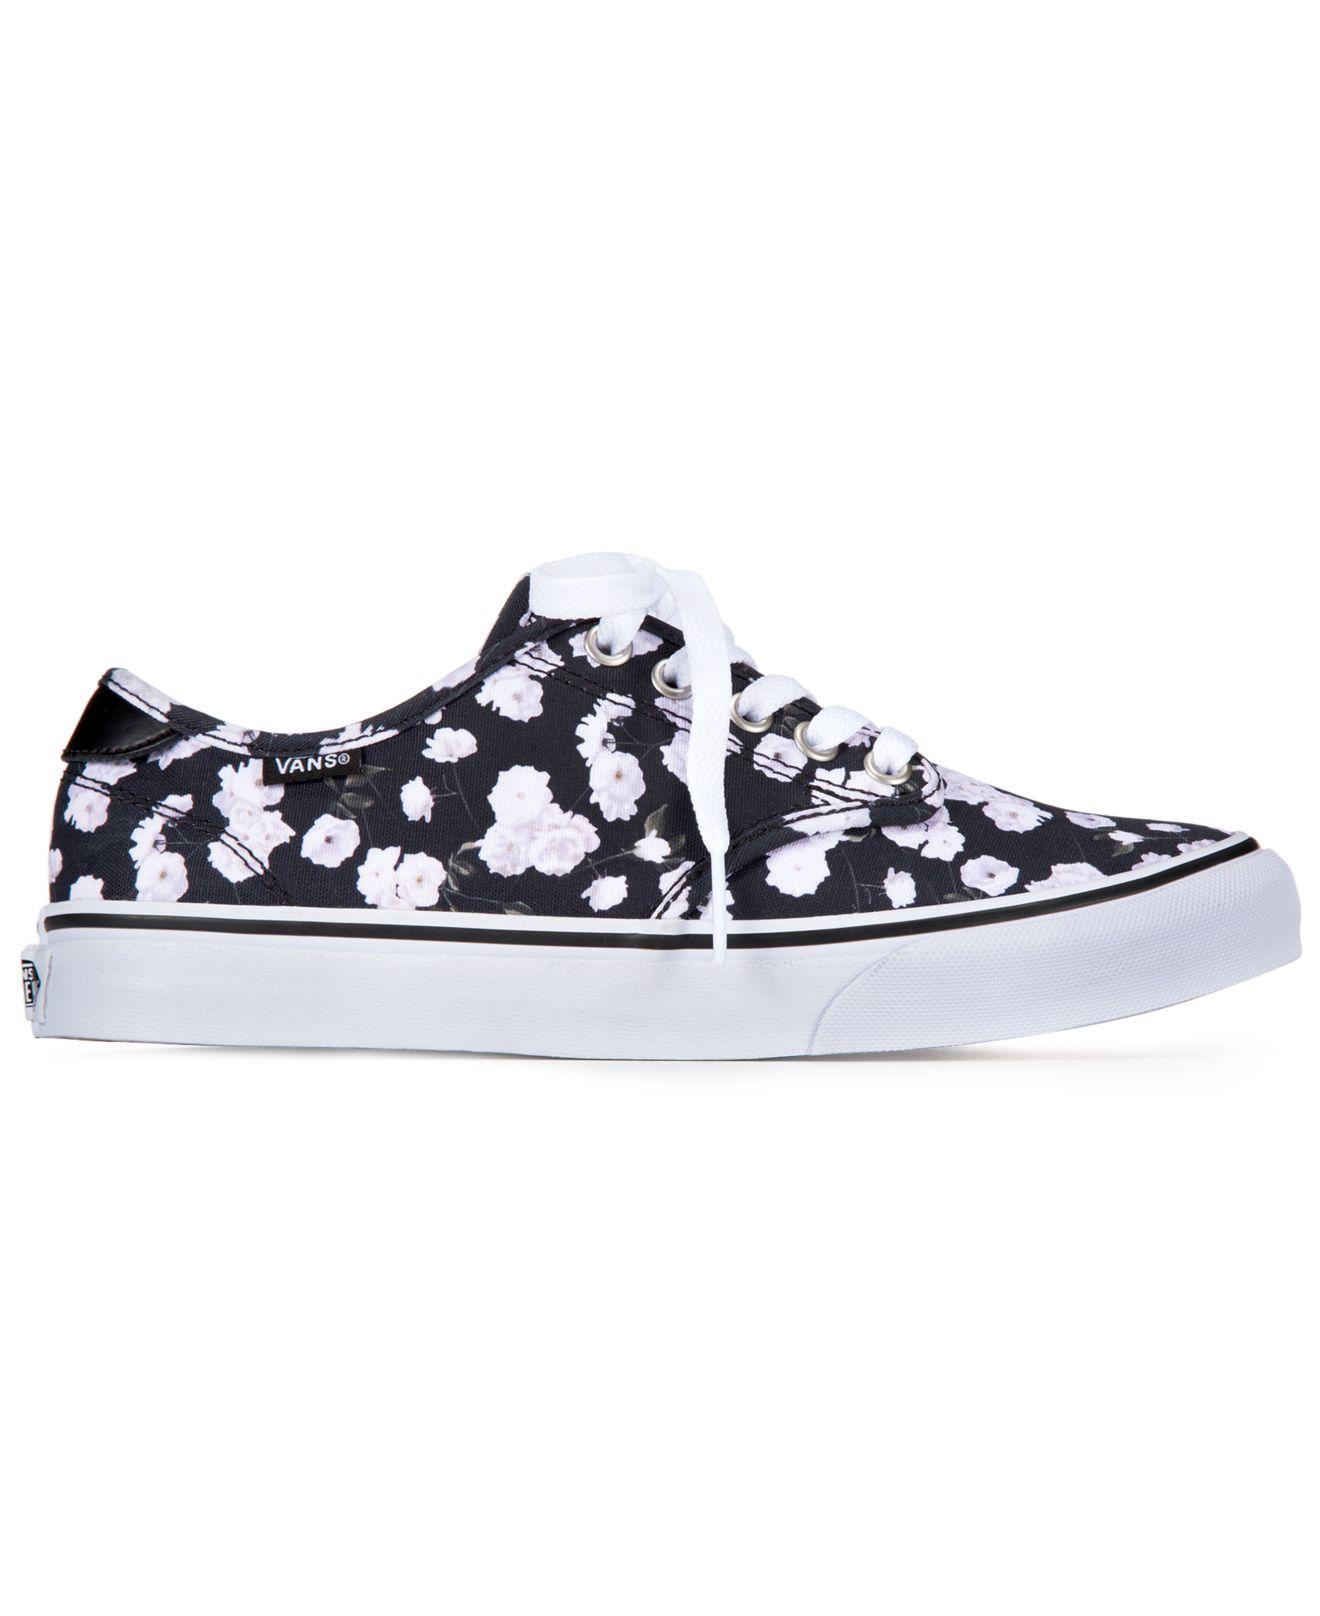 51211a597e Sneakers In Floral Women s Lyst Camden Black Vans qPwUgzI